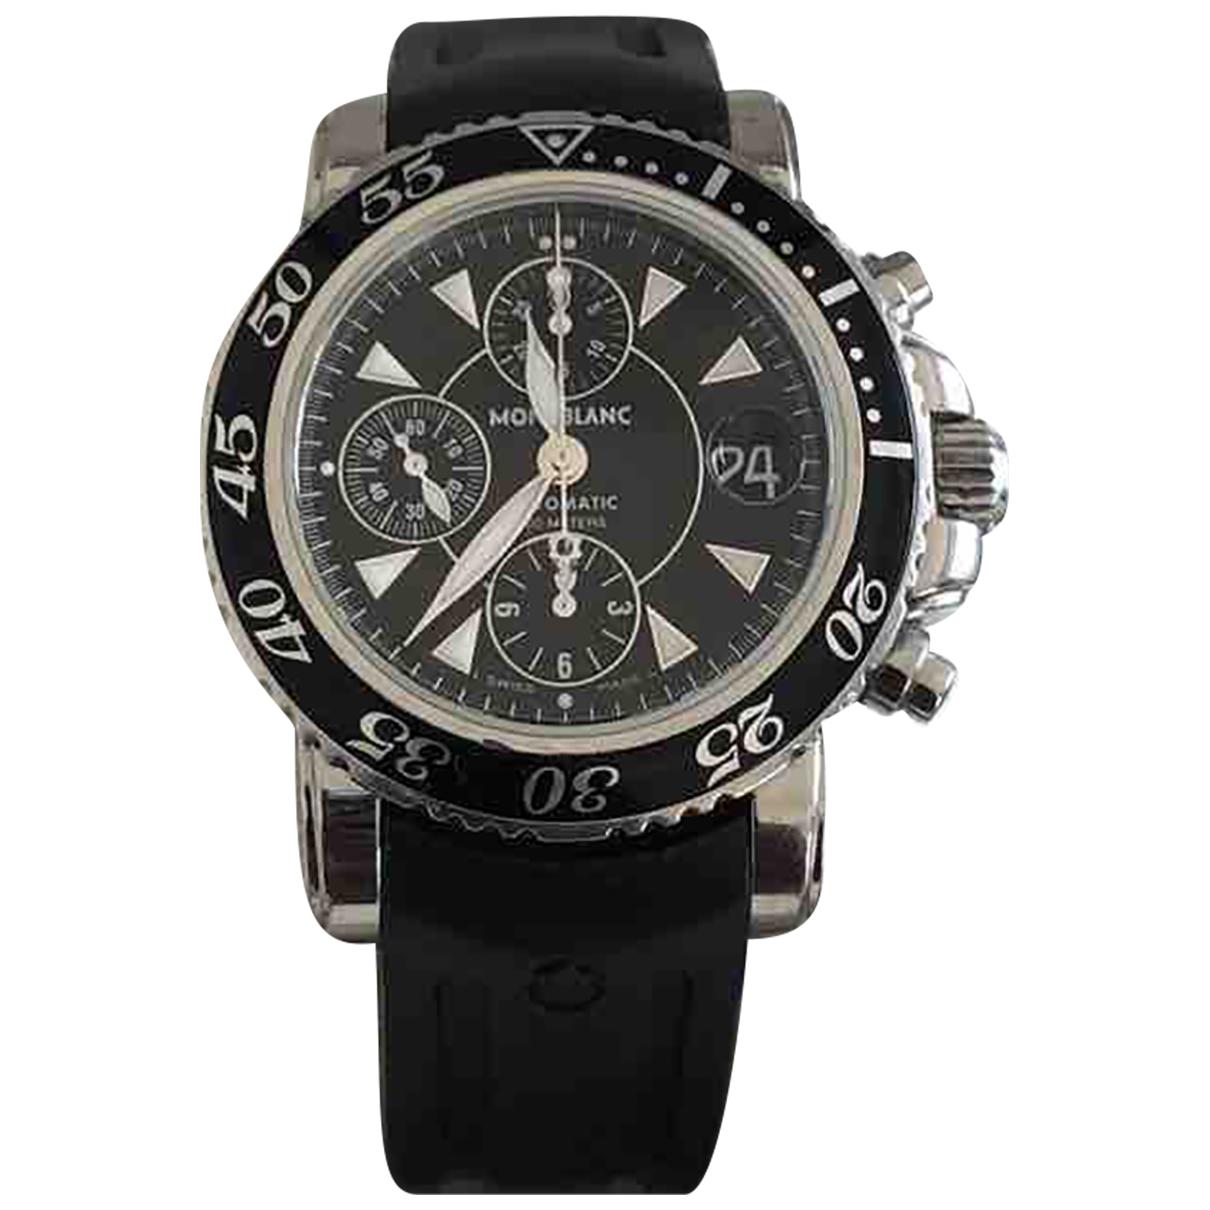 Montblanc Meisterstuck Black Steel watch for Men N